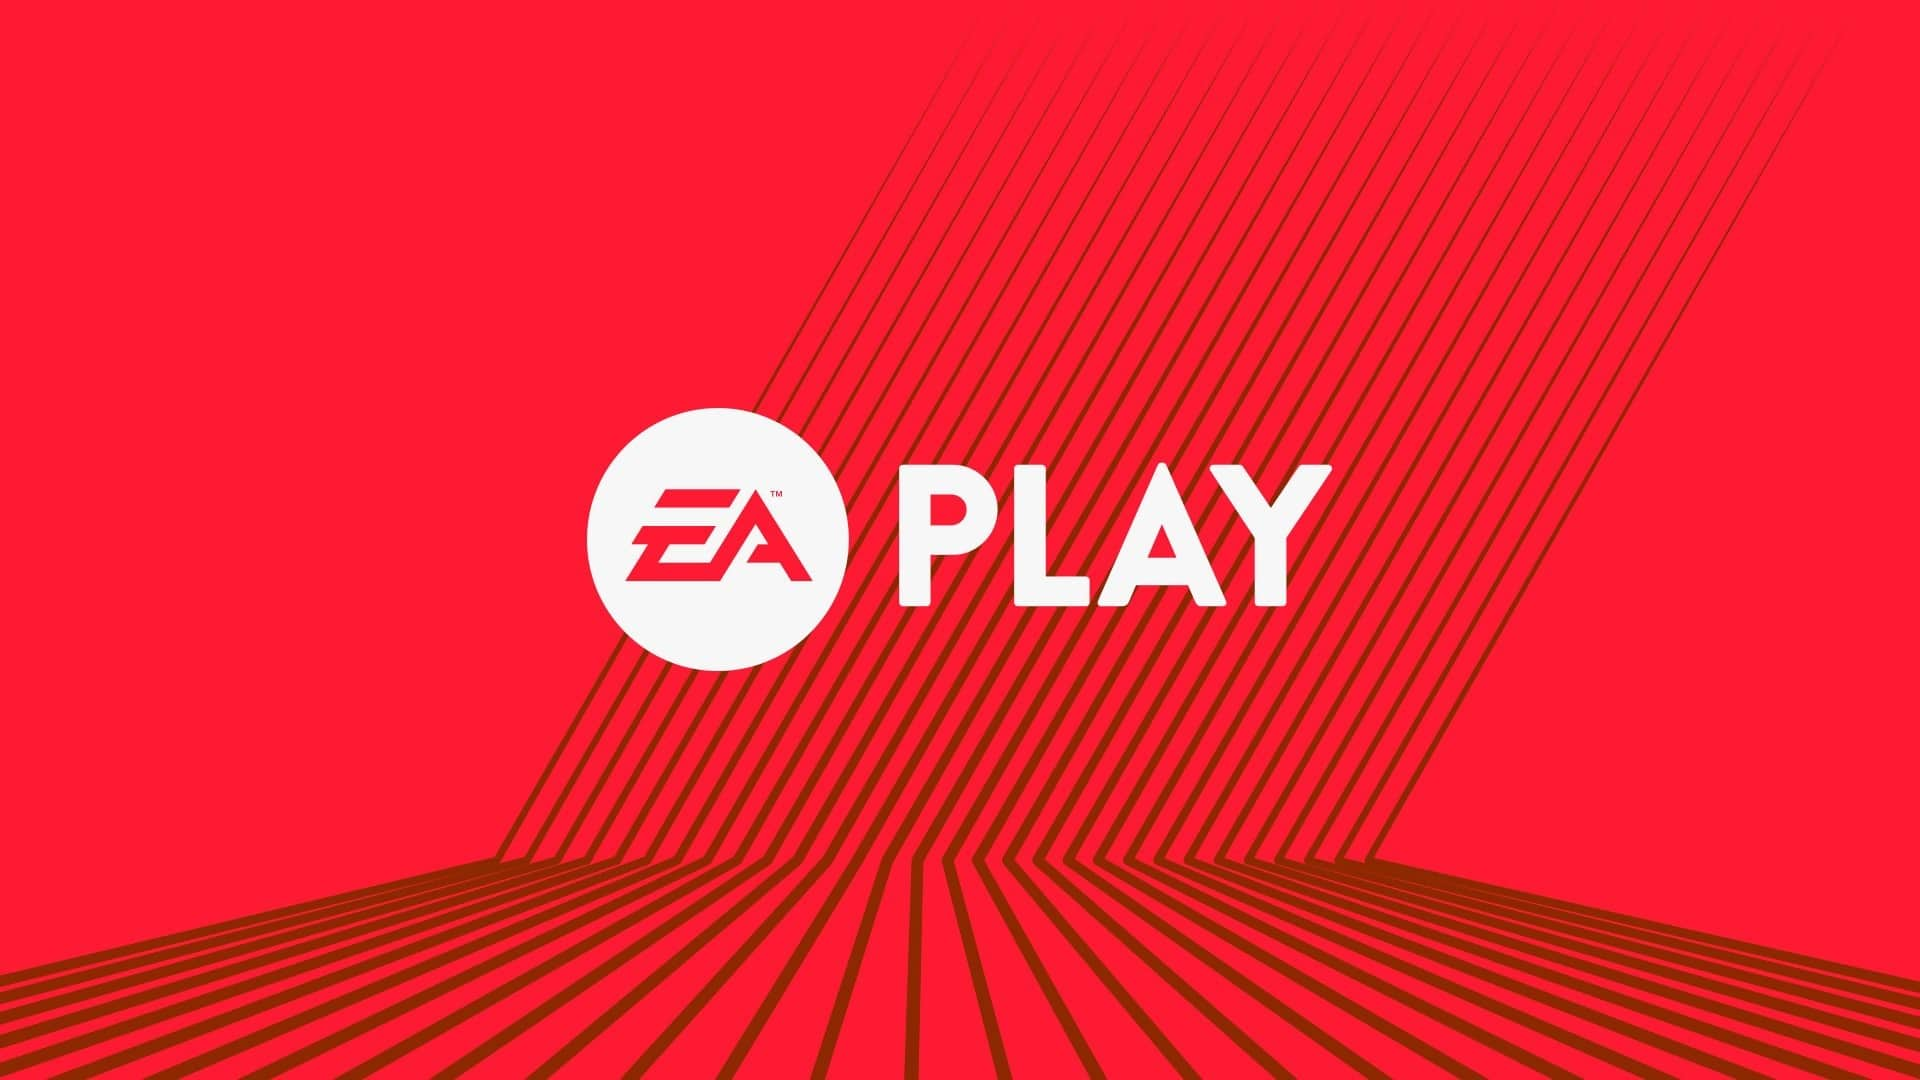 ea-play.jpg